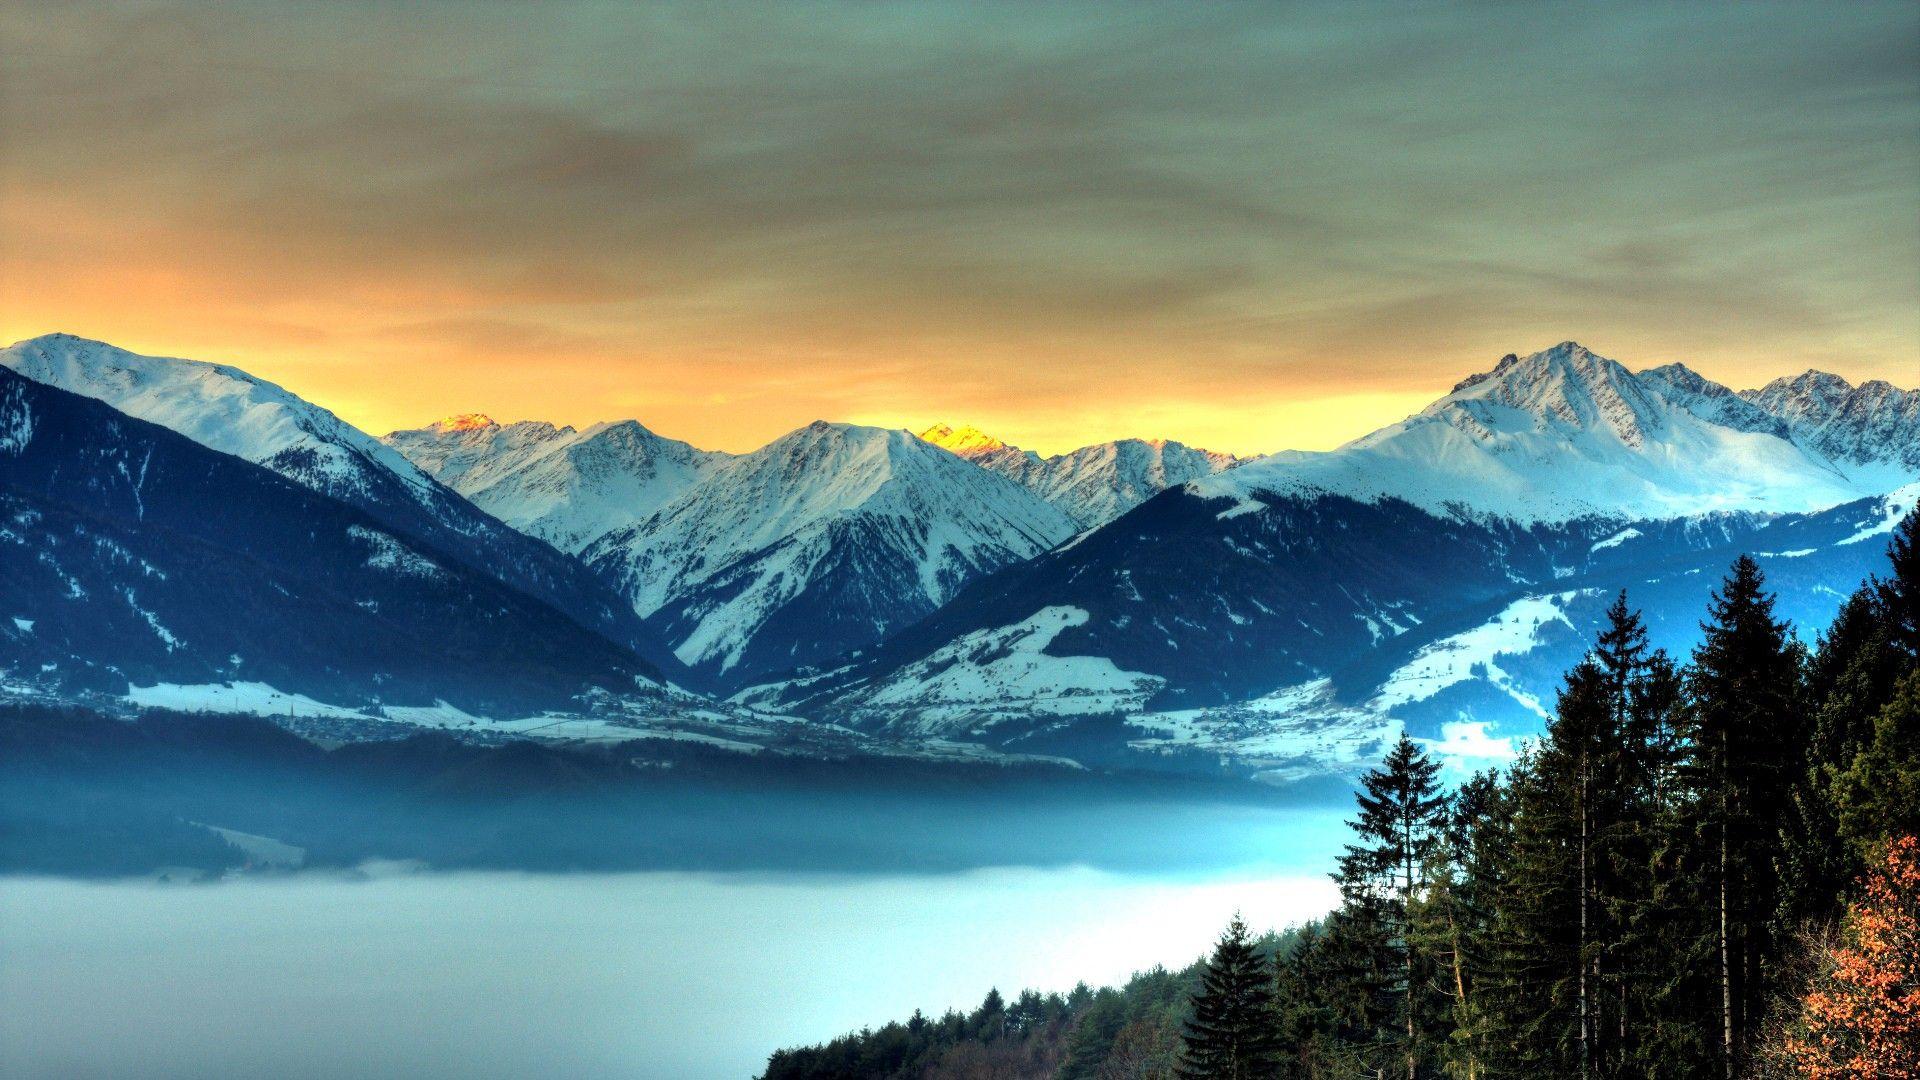 Ice Mountain Range Wallpaper Mountain Wallpaper Landscape Wallpaper Nature Wallpaper